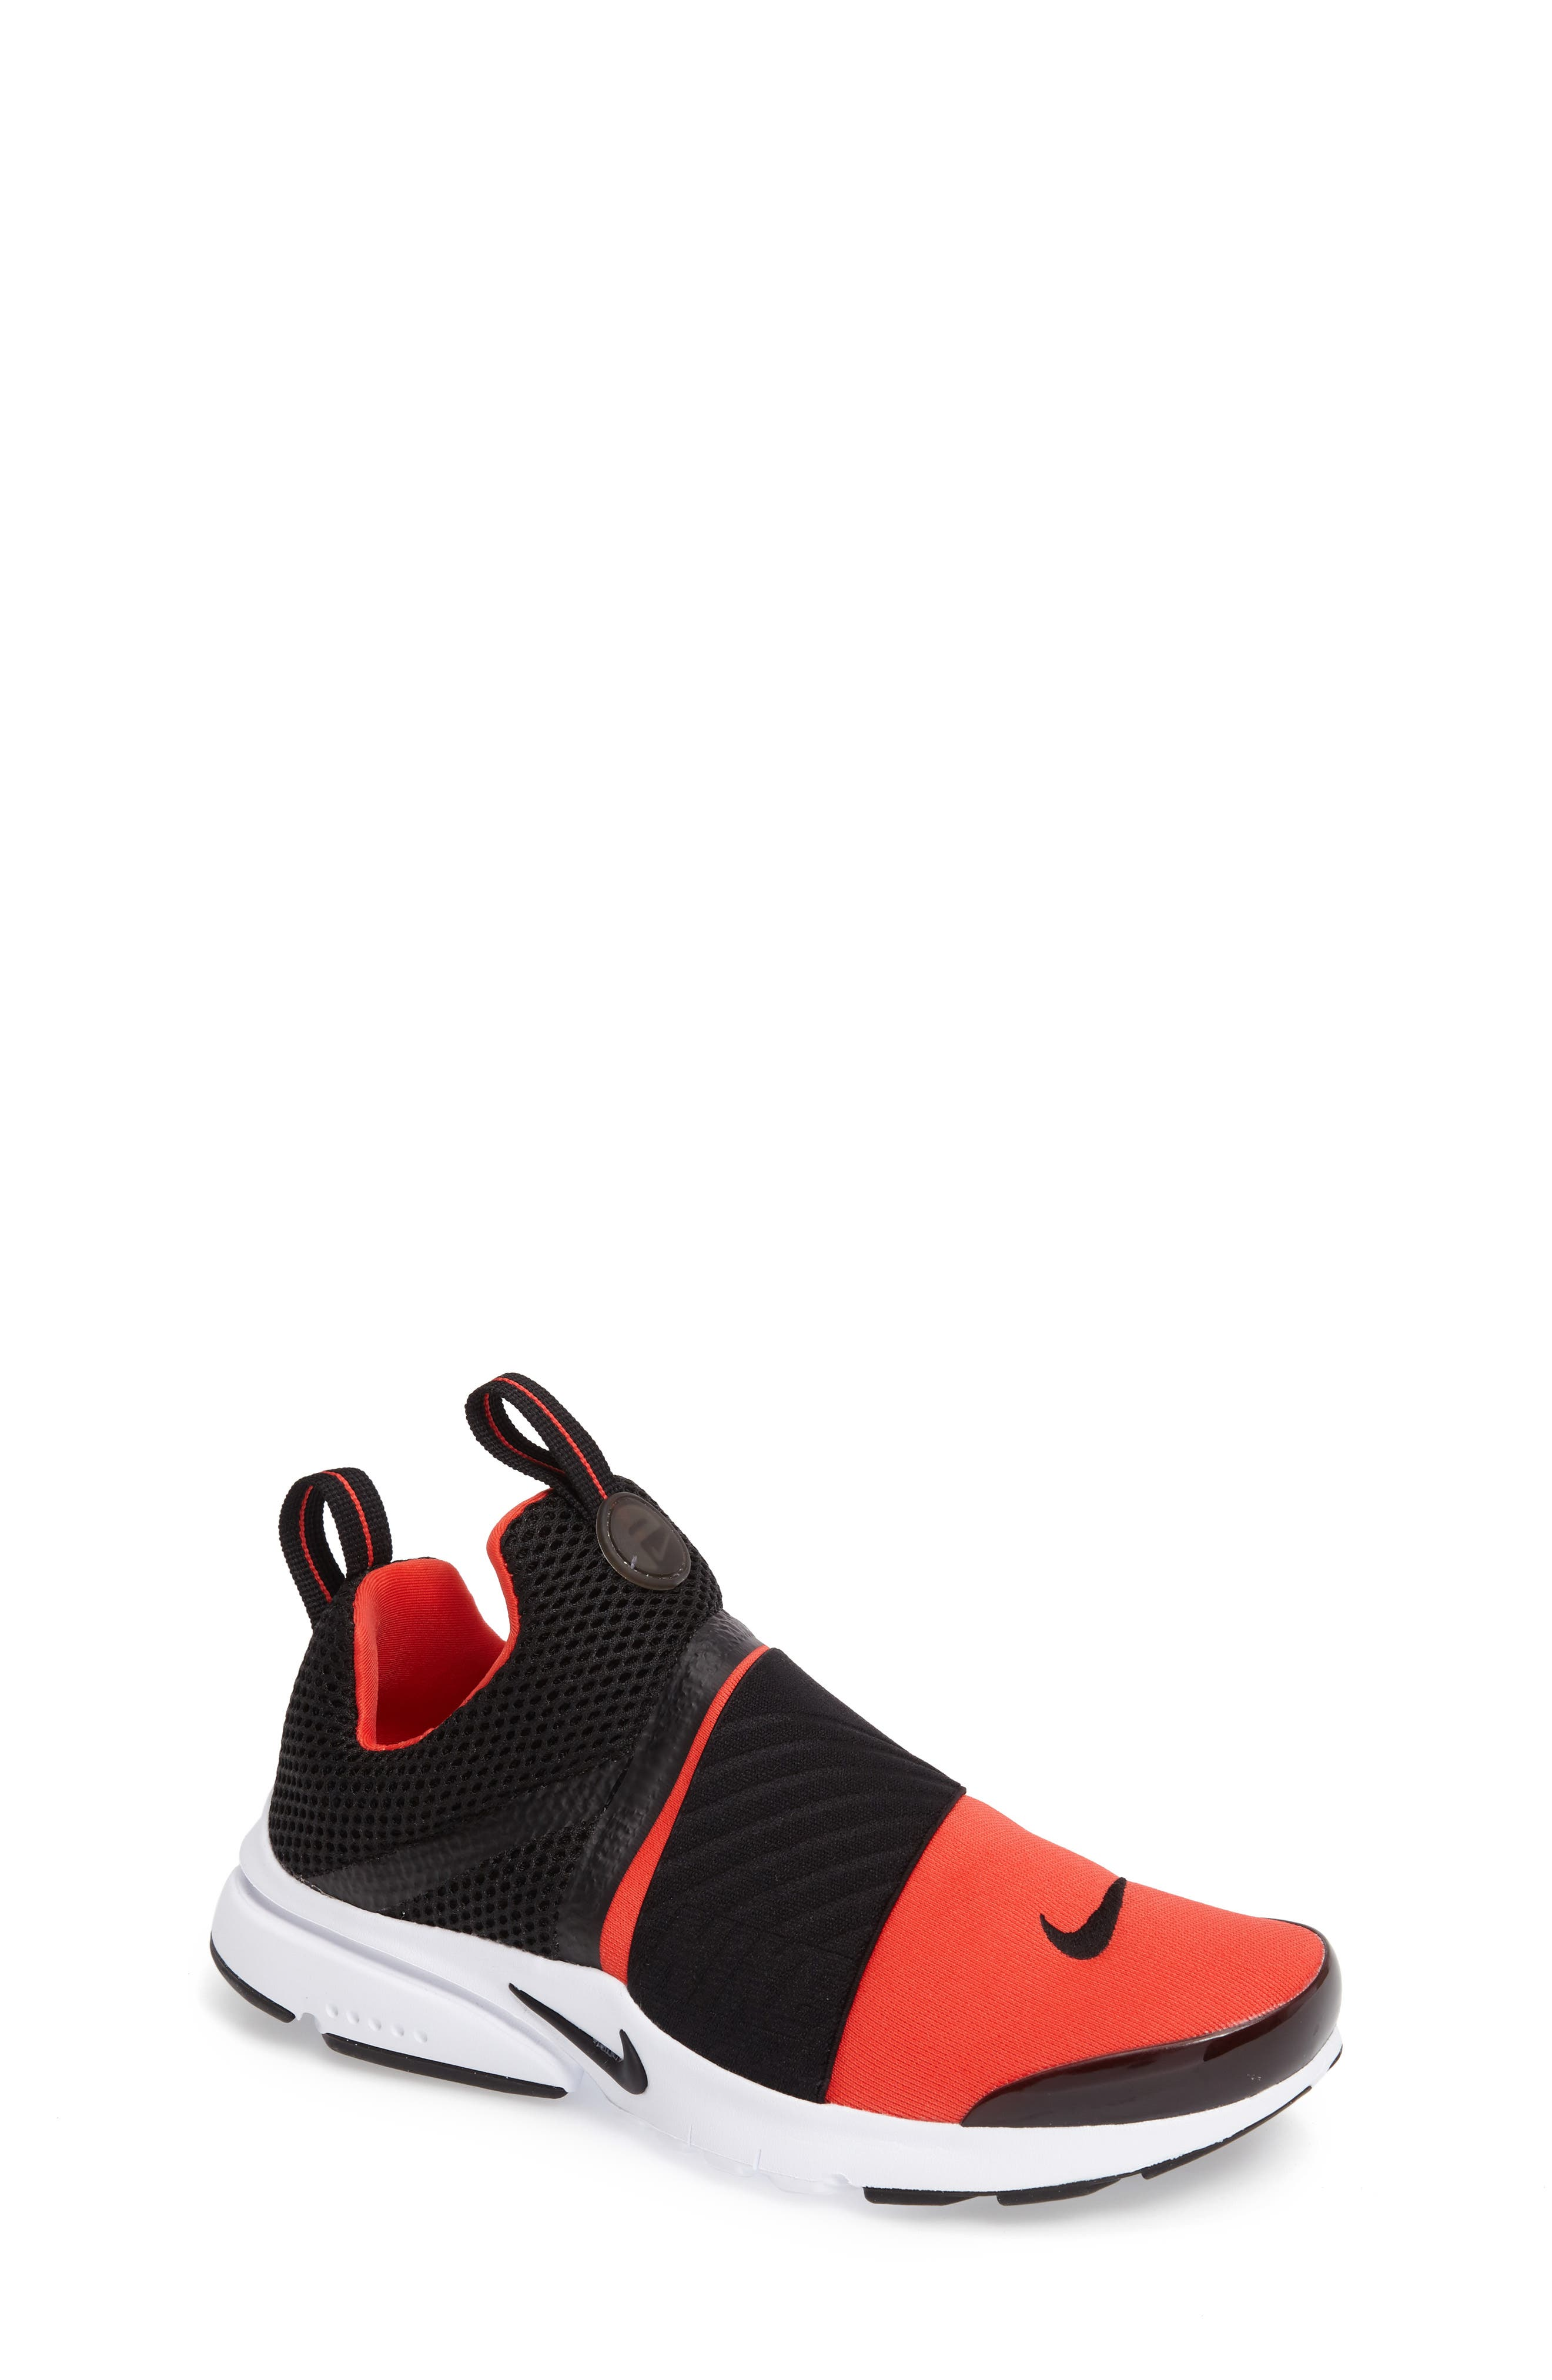 Presto Extreme Sneaker,                             Main thumbnail 11, color,